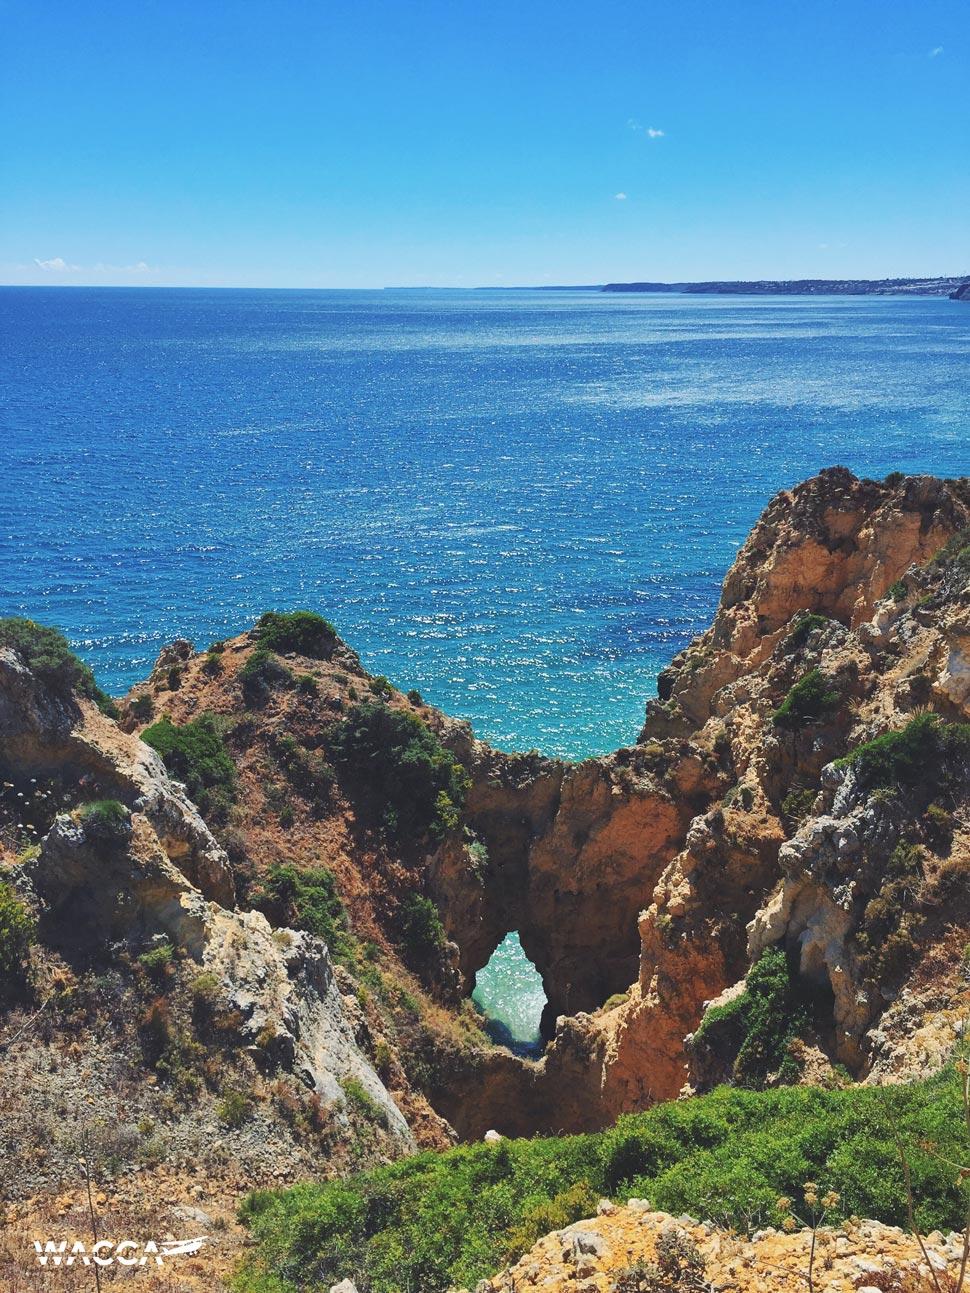 portugal-algarve-lagos-wacca-04